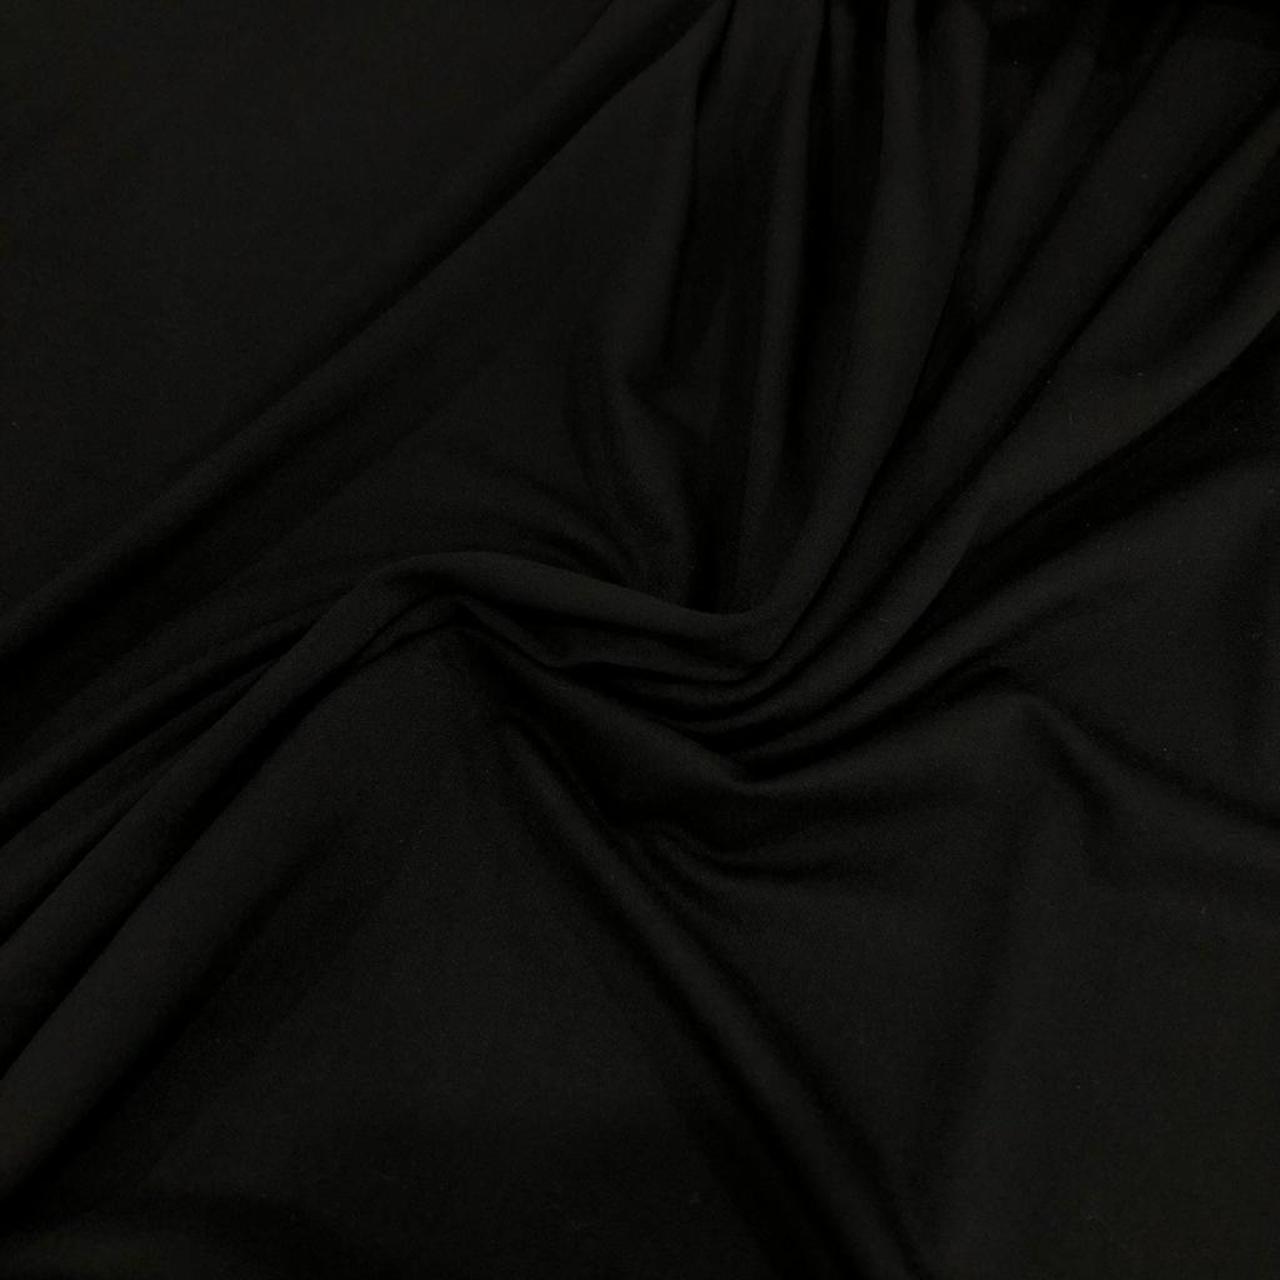 Tecido Malha Viscolycra  92%Viscose 8%Elastano Preto